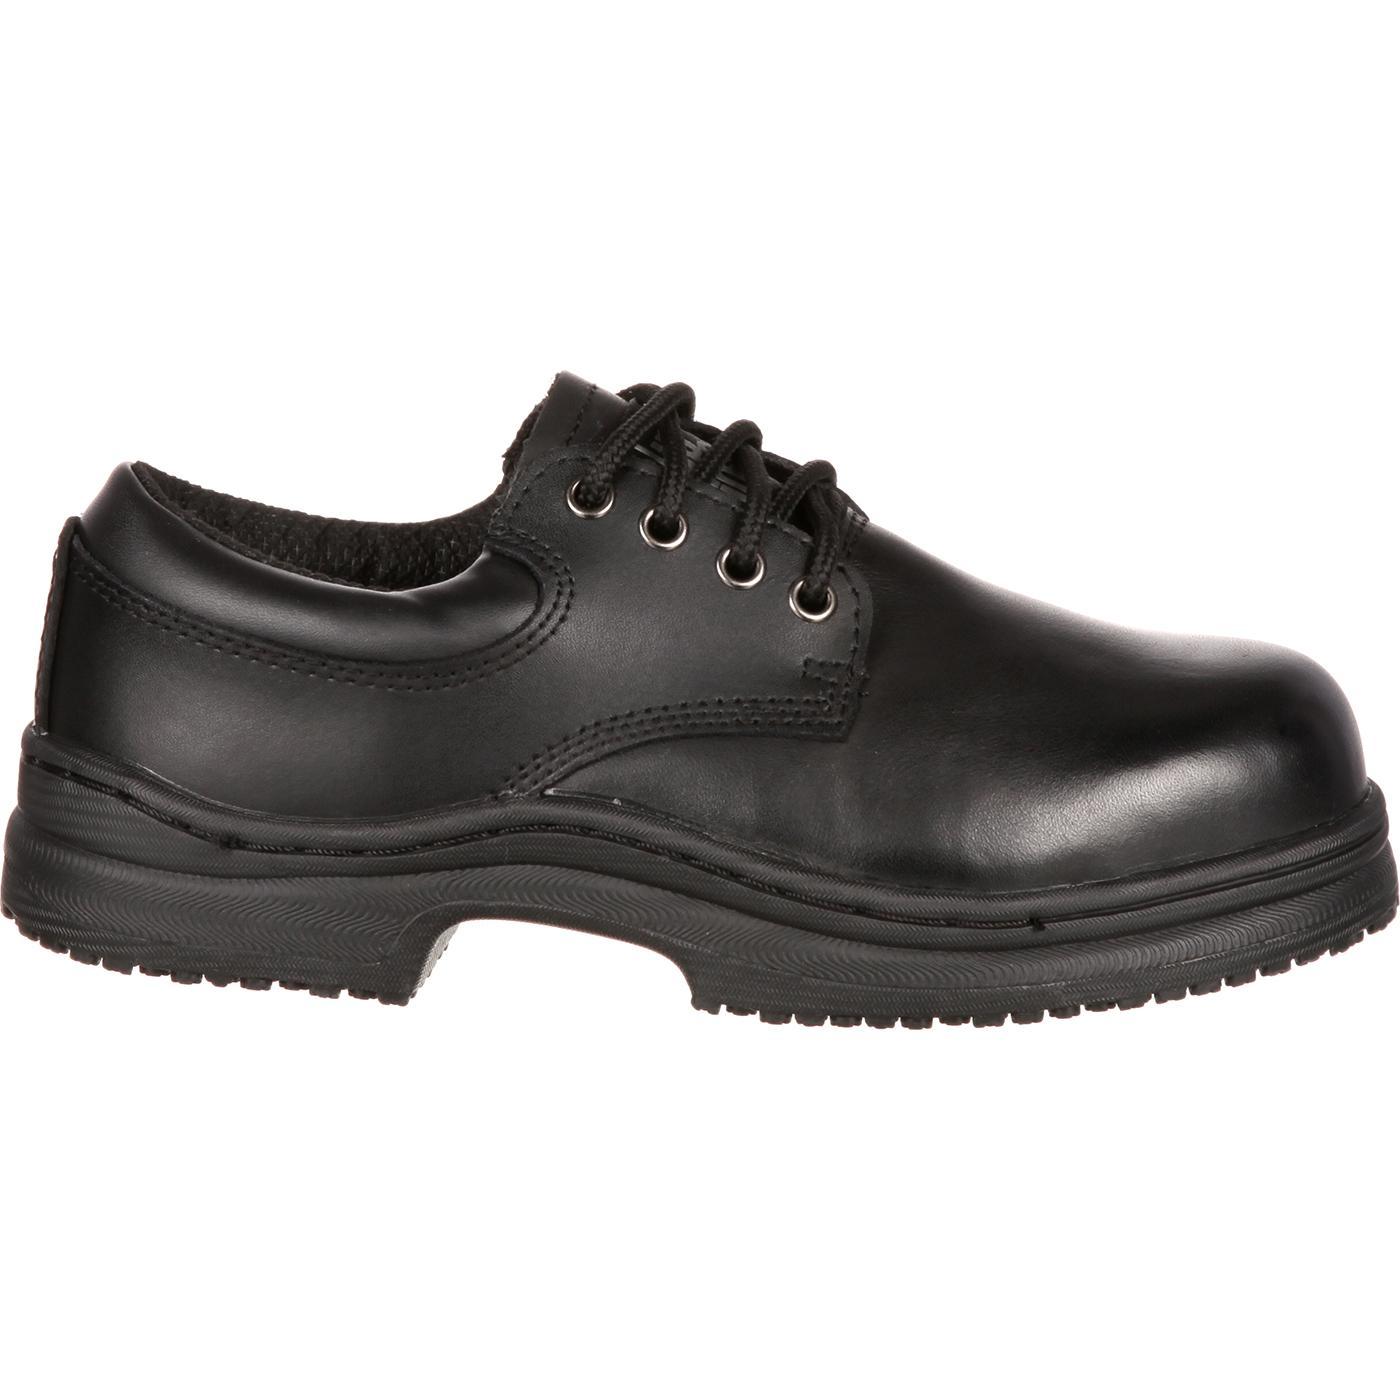 slipgrips steel toe slip resistant oxfords 5332